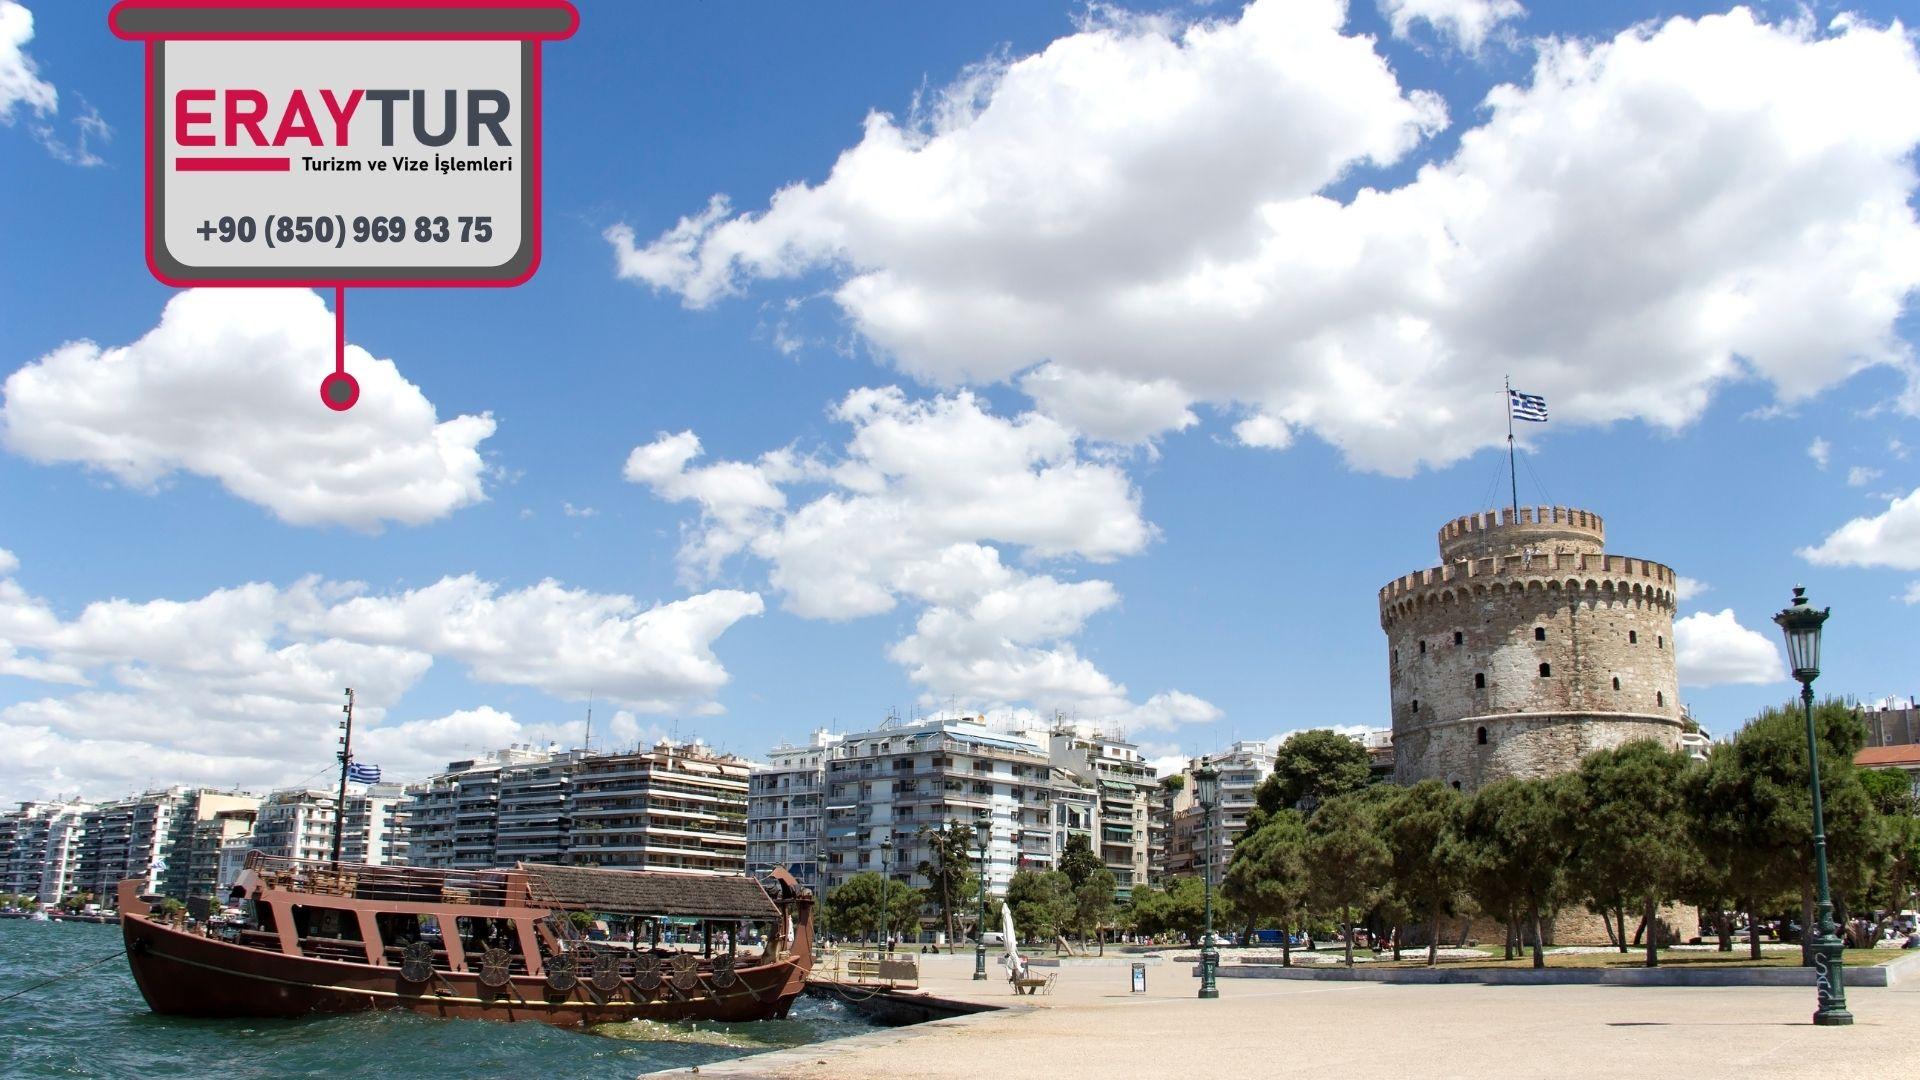 Yunanistan Turistik Vize Ücreti